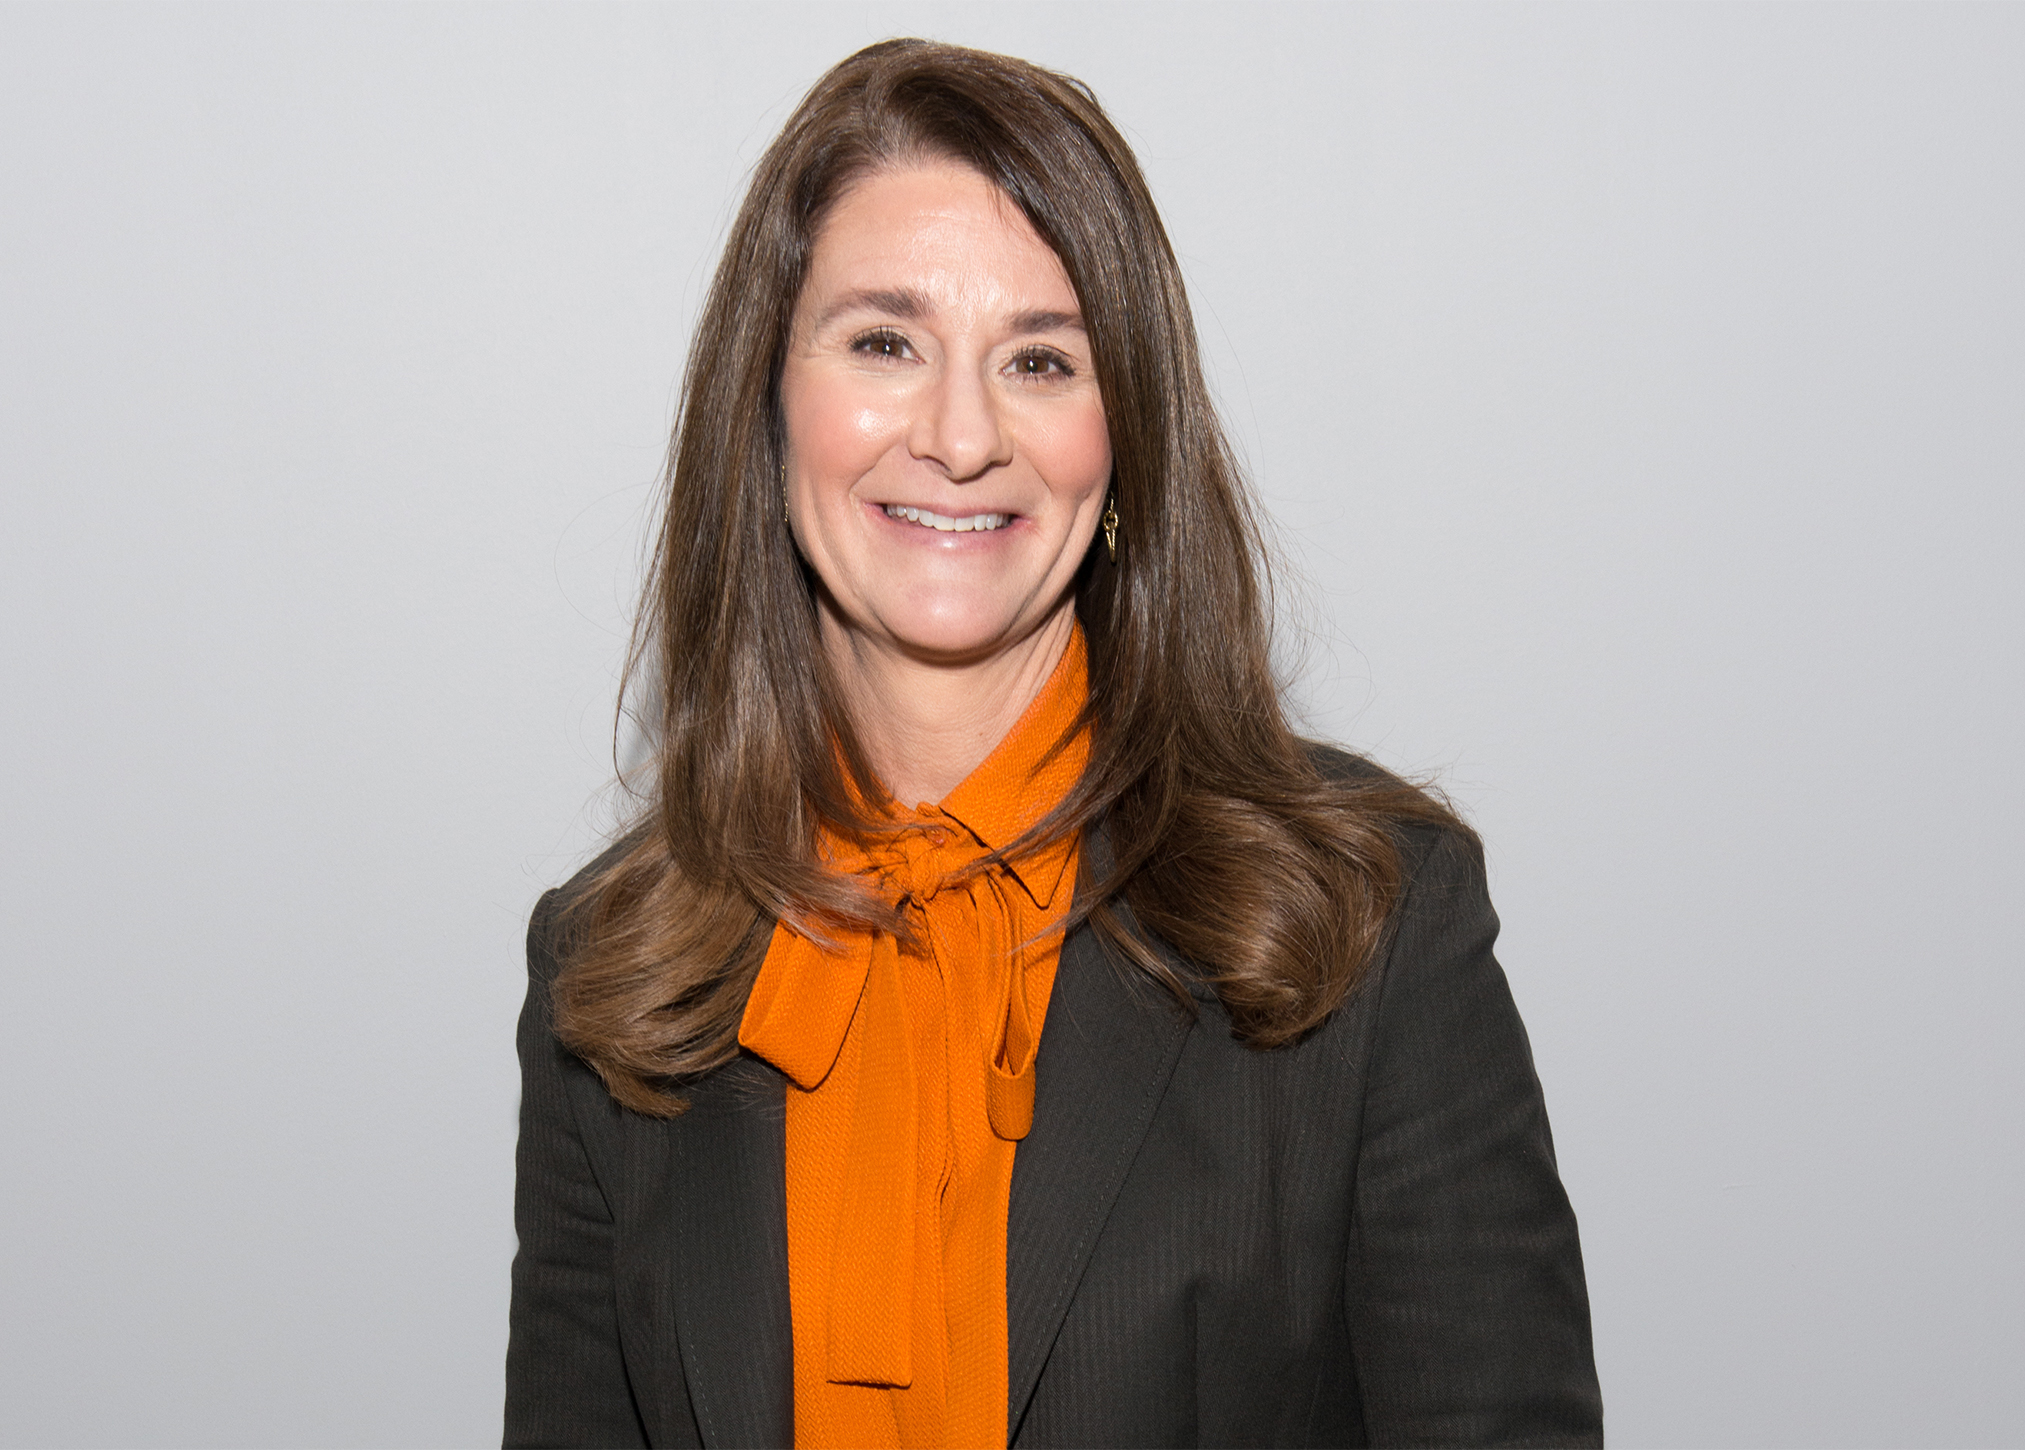 Melinda Gates - IMDb